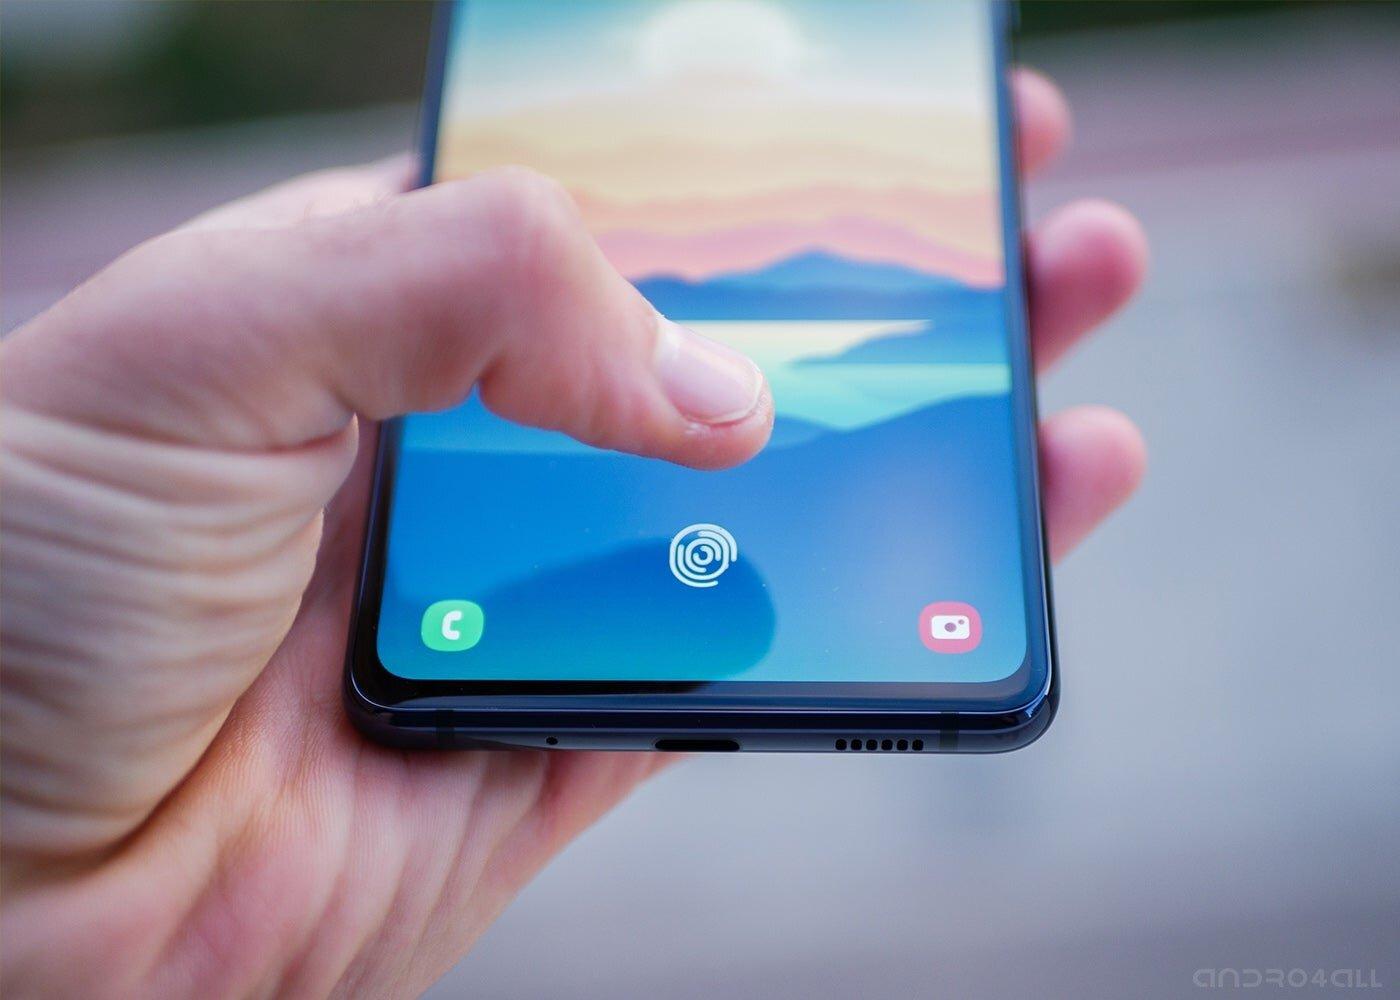 Lecteur d'empreintes digitales sur l'écran du Samsung Galaxy S20 FE